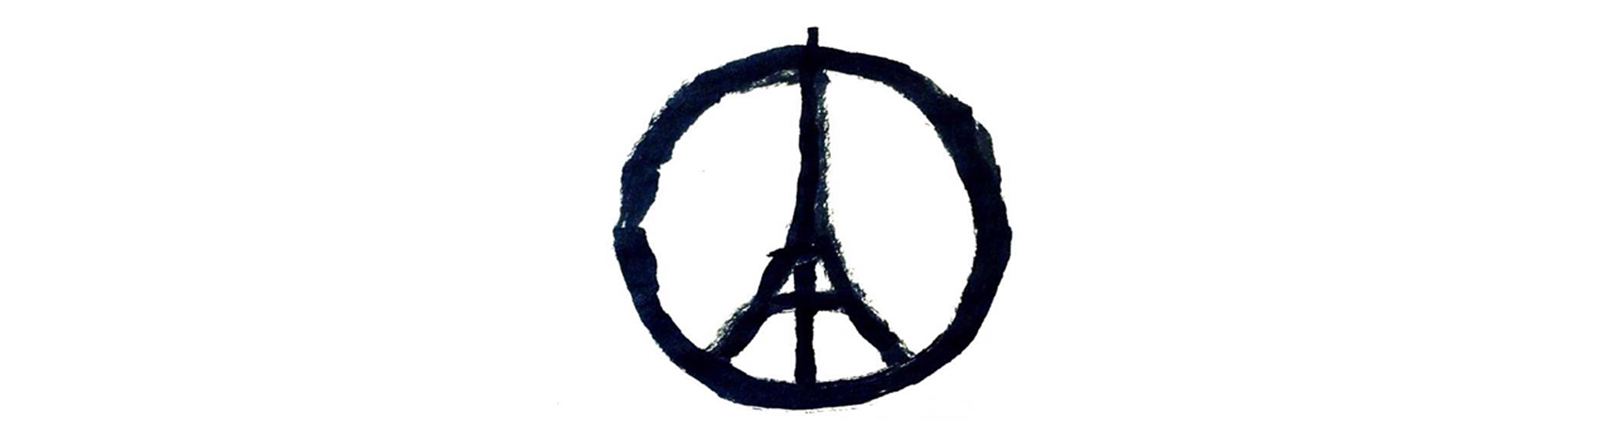 Peacesymbol mit Eiffelturm